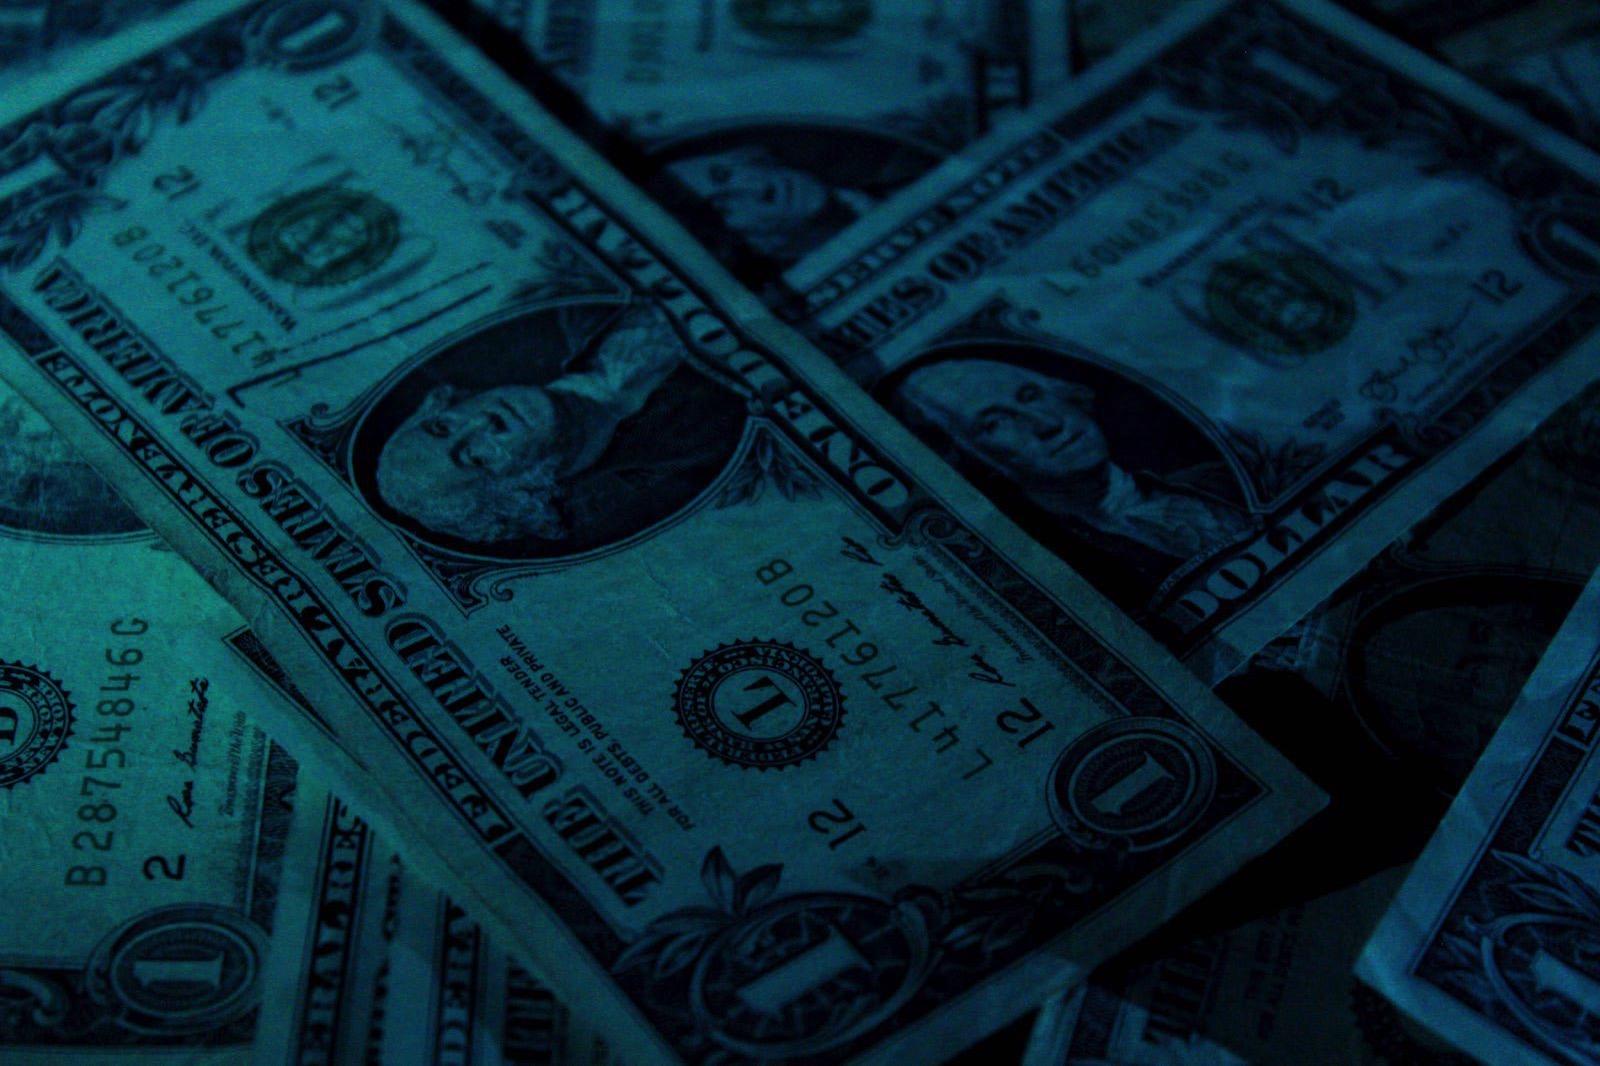 Aidan bartos 313782 unsplash lots of money